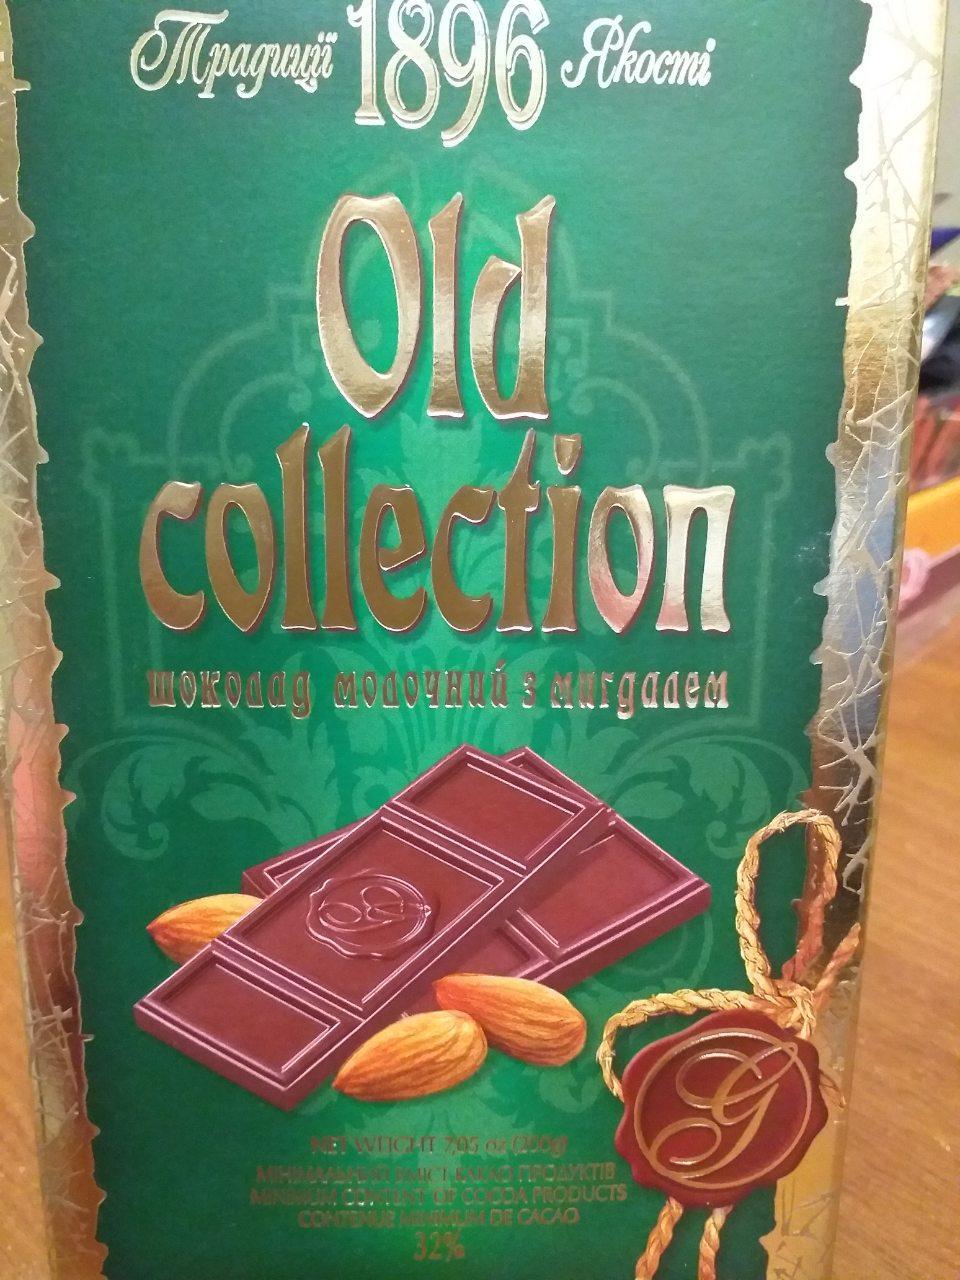 Молочный шоколад с мигдалем  200 грамм